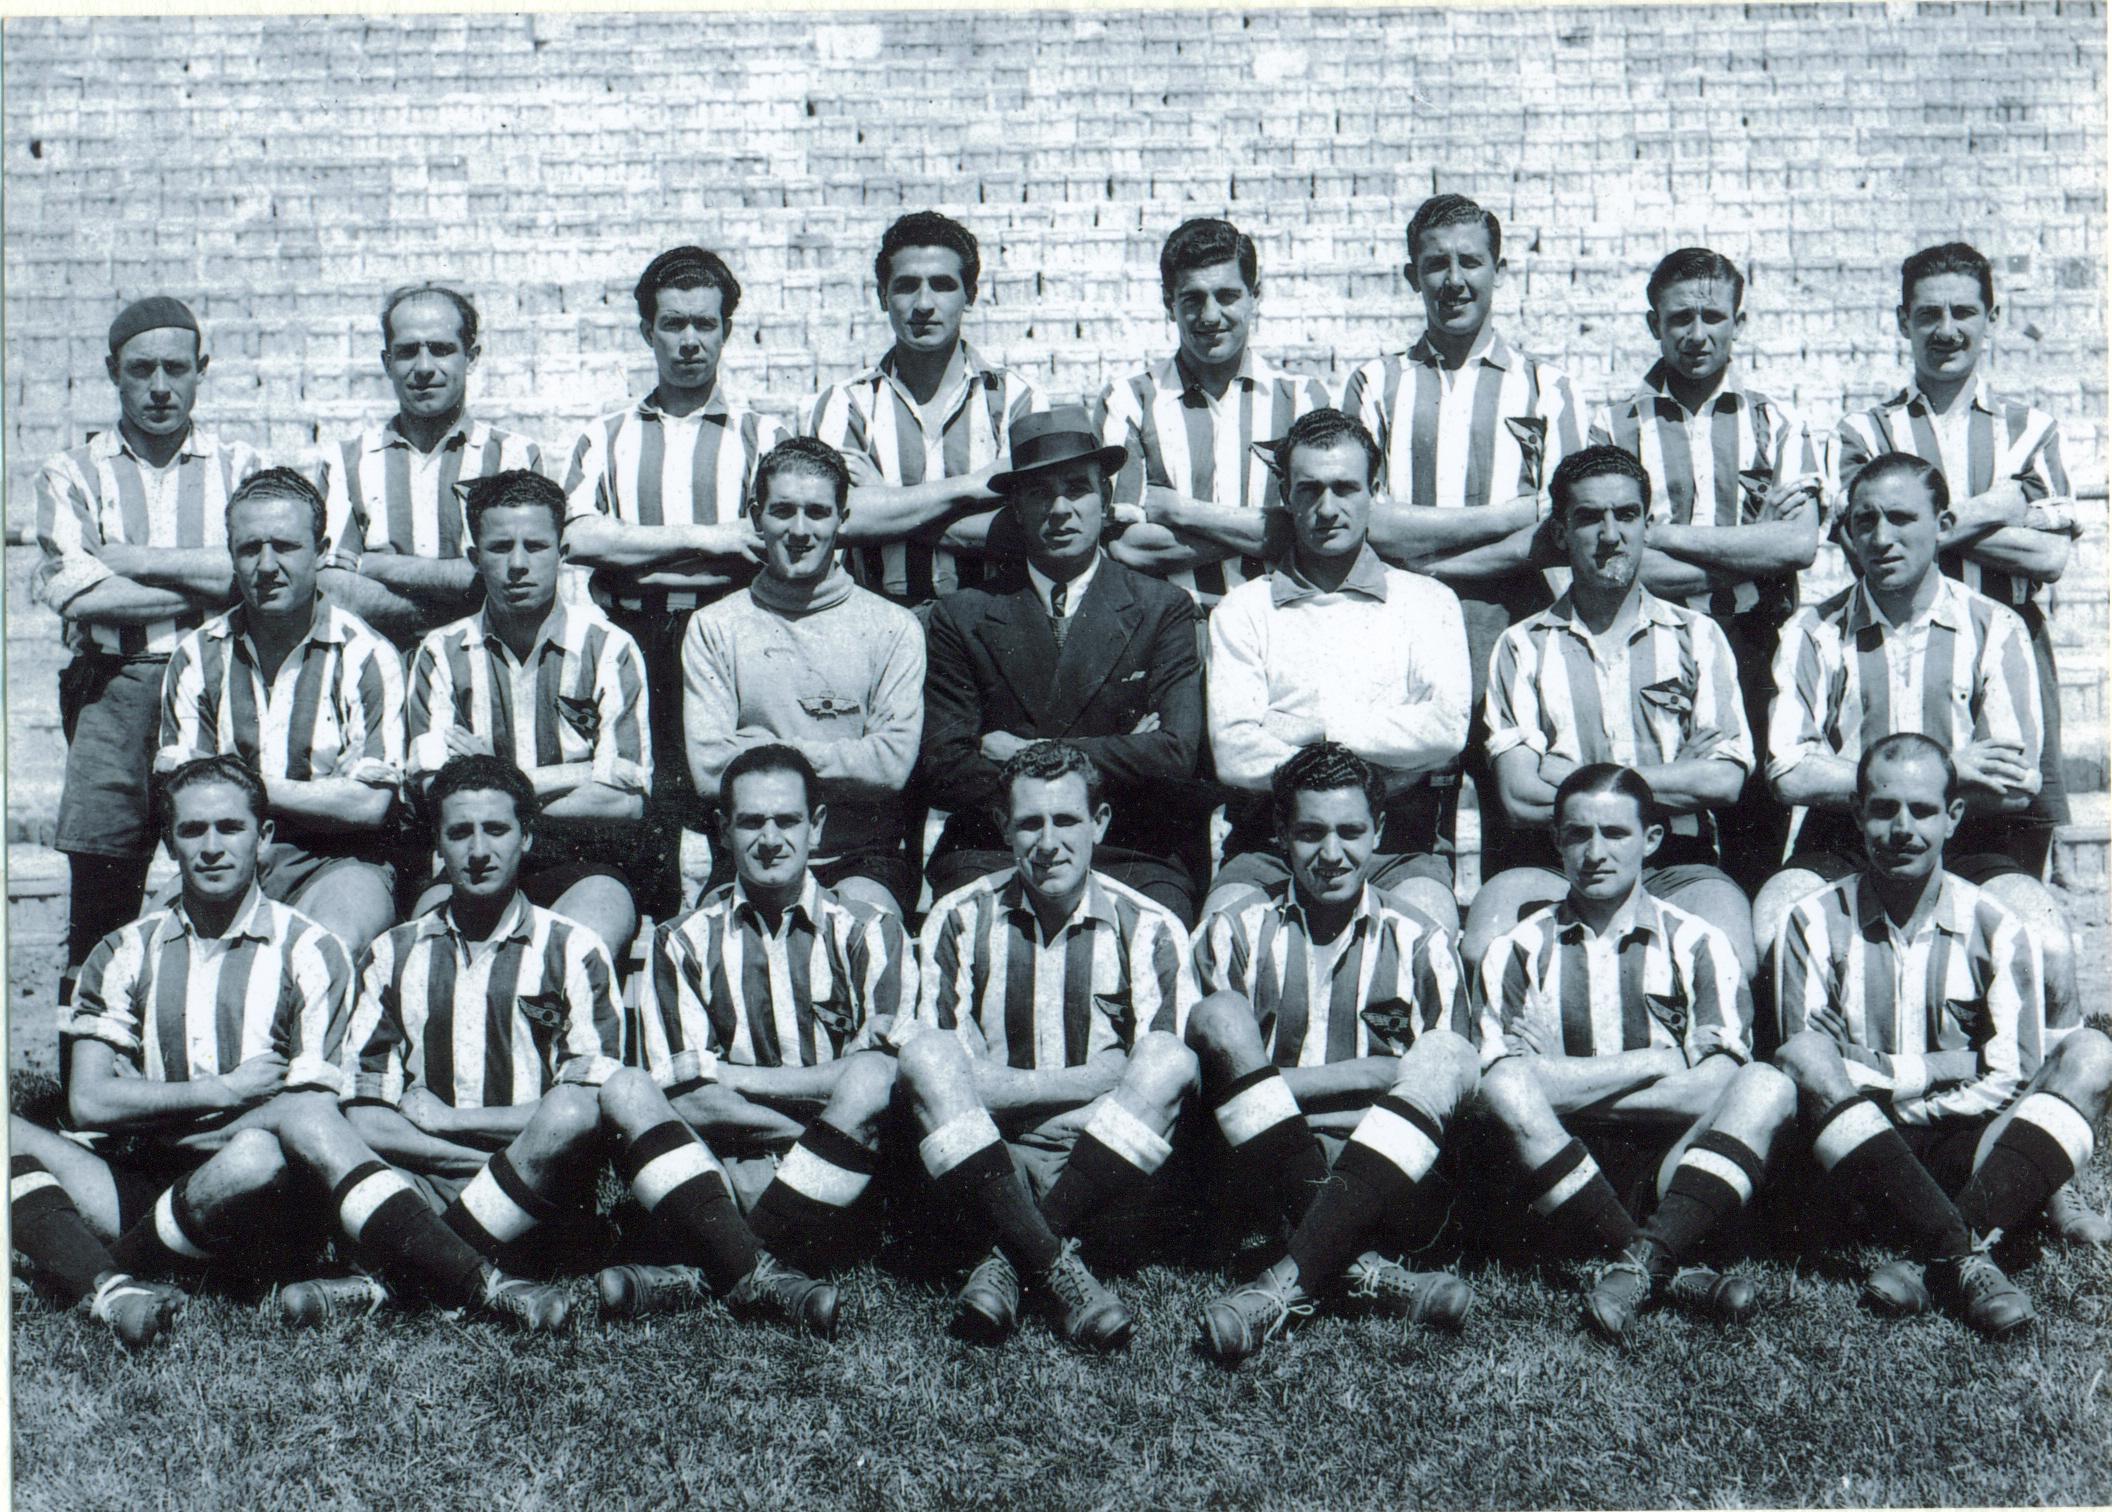 L'Atlético Aviacion, antenato dei Colchoneros